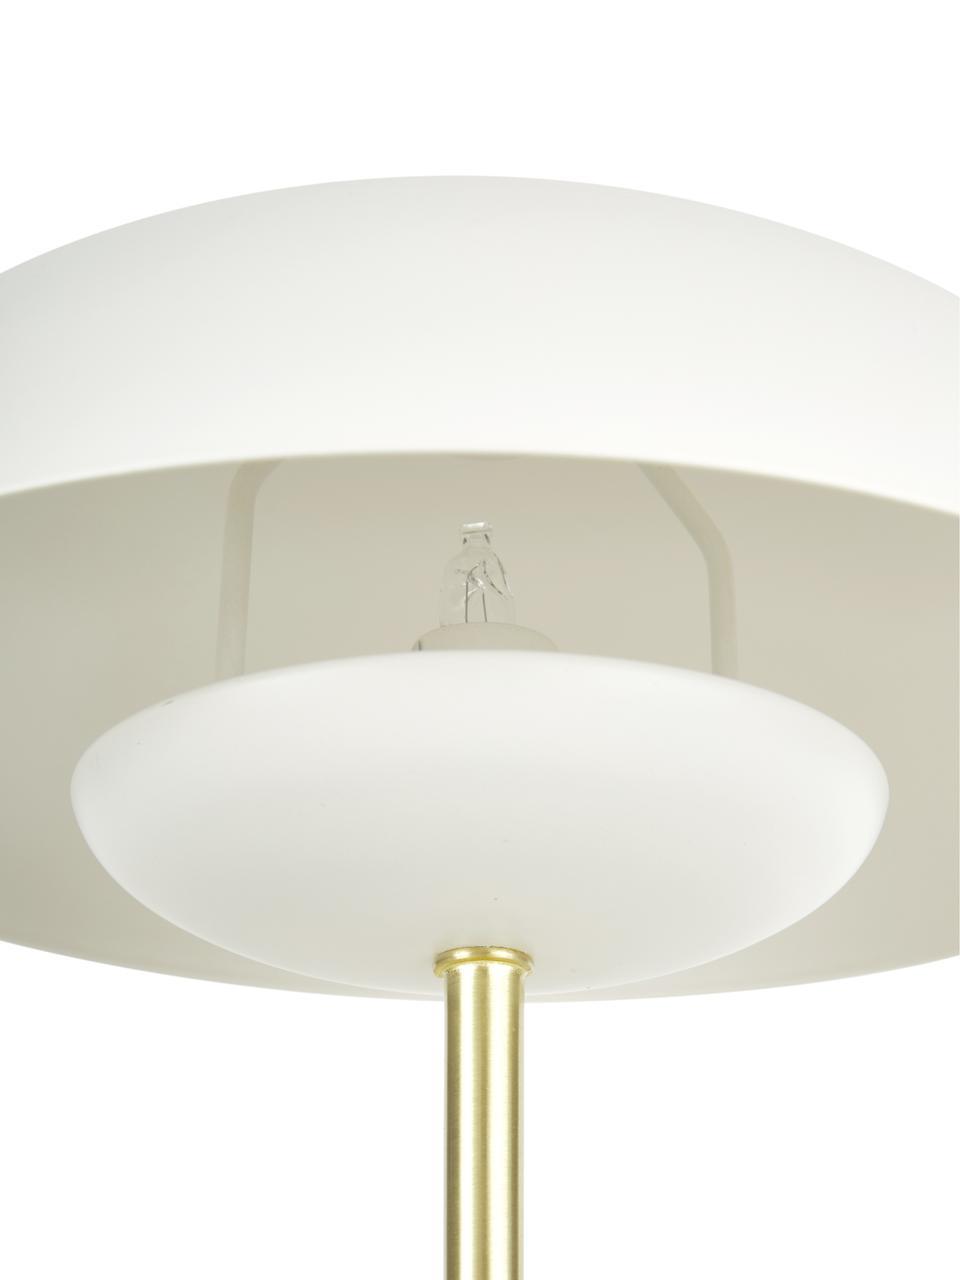 Tafellamp Mathea, Lampenkap: gepoedercoat metaal, Lampvoet: vermessingd metaal, Wit, messingkleurig, Ø 23 x H 36 cm